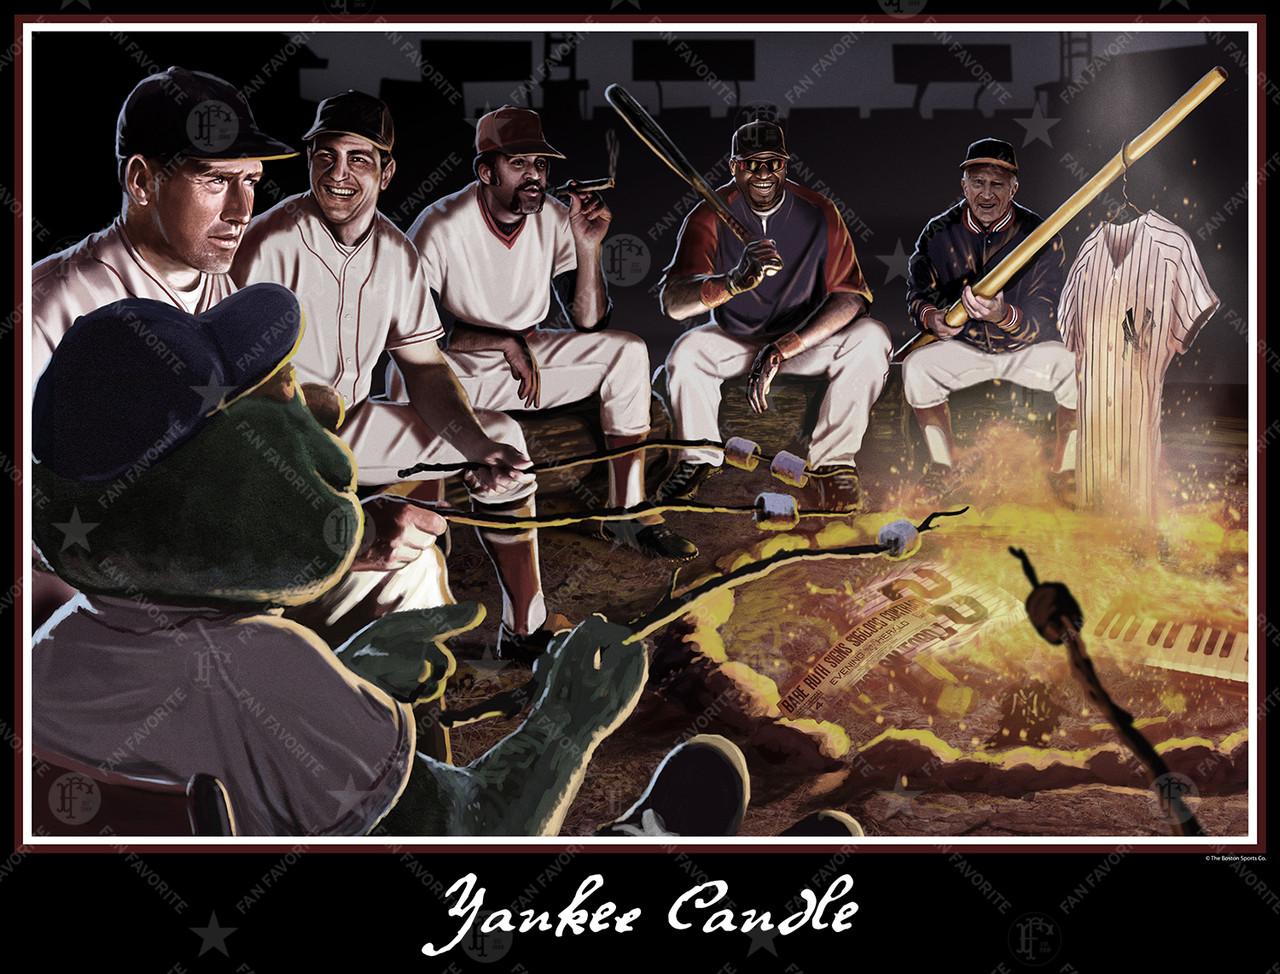 YANKEE CANDLE (WALL PRINT)